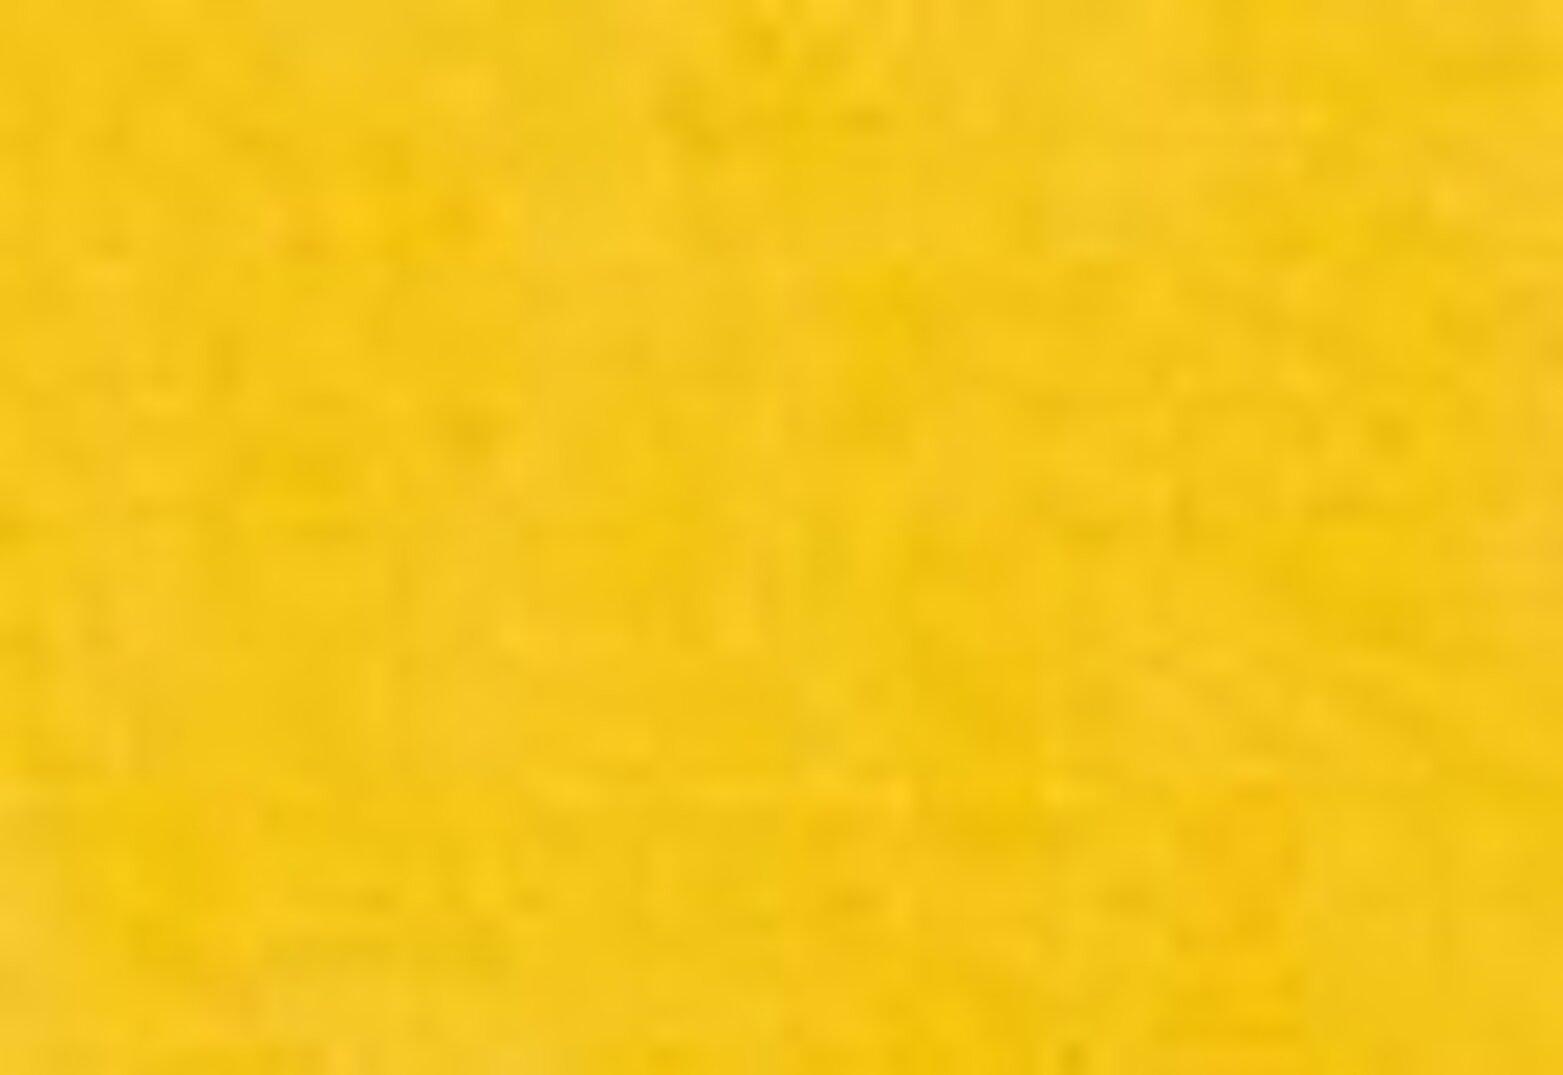 Football Tee Jogging Snoopy Sarı/Turuncu Erkek Tişört